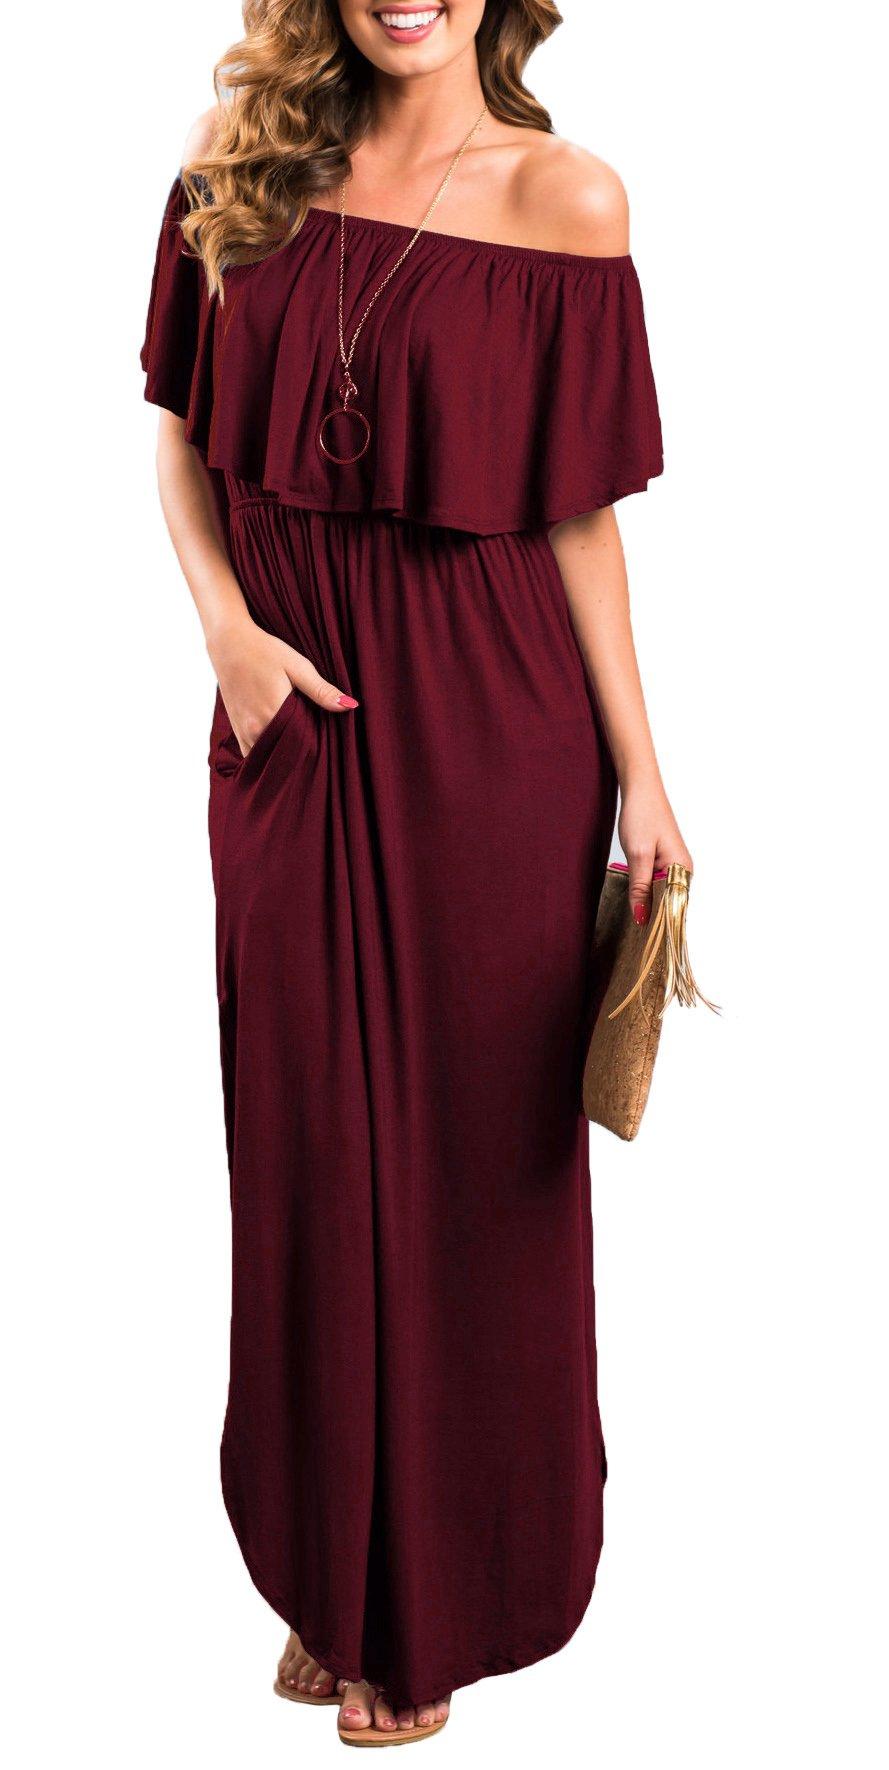 Oyanus Womens Off The Shoulder Ruffles Pockets Dress Side Split Maxi Dresses Wine Red M